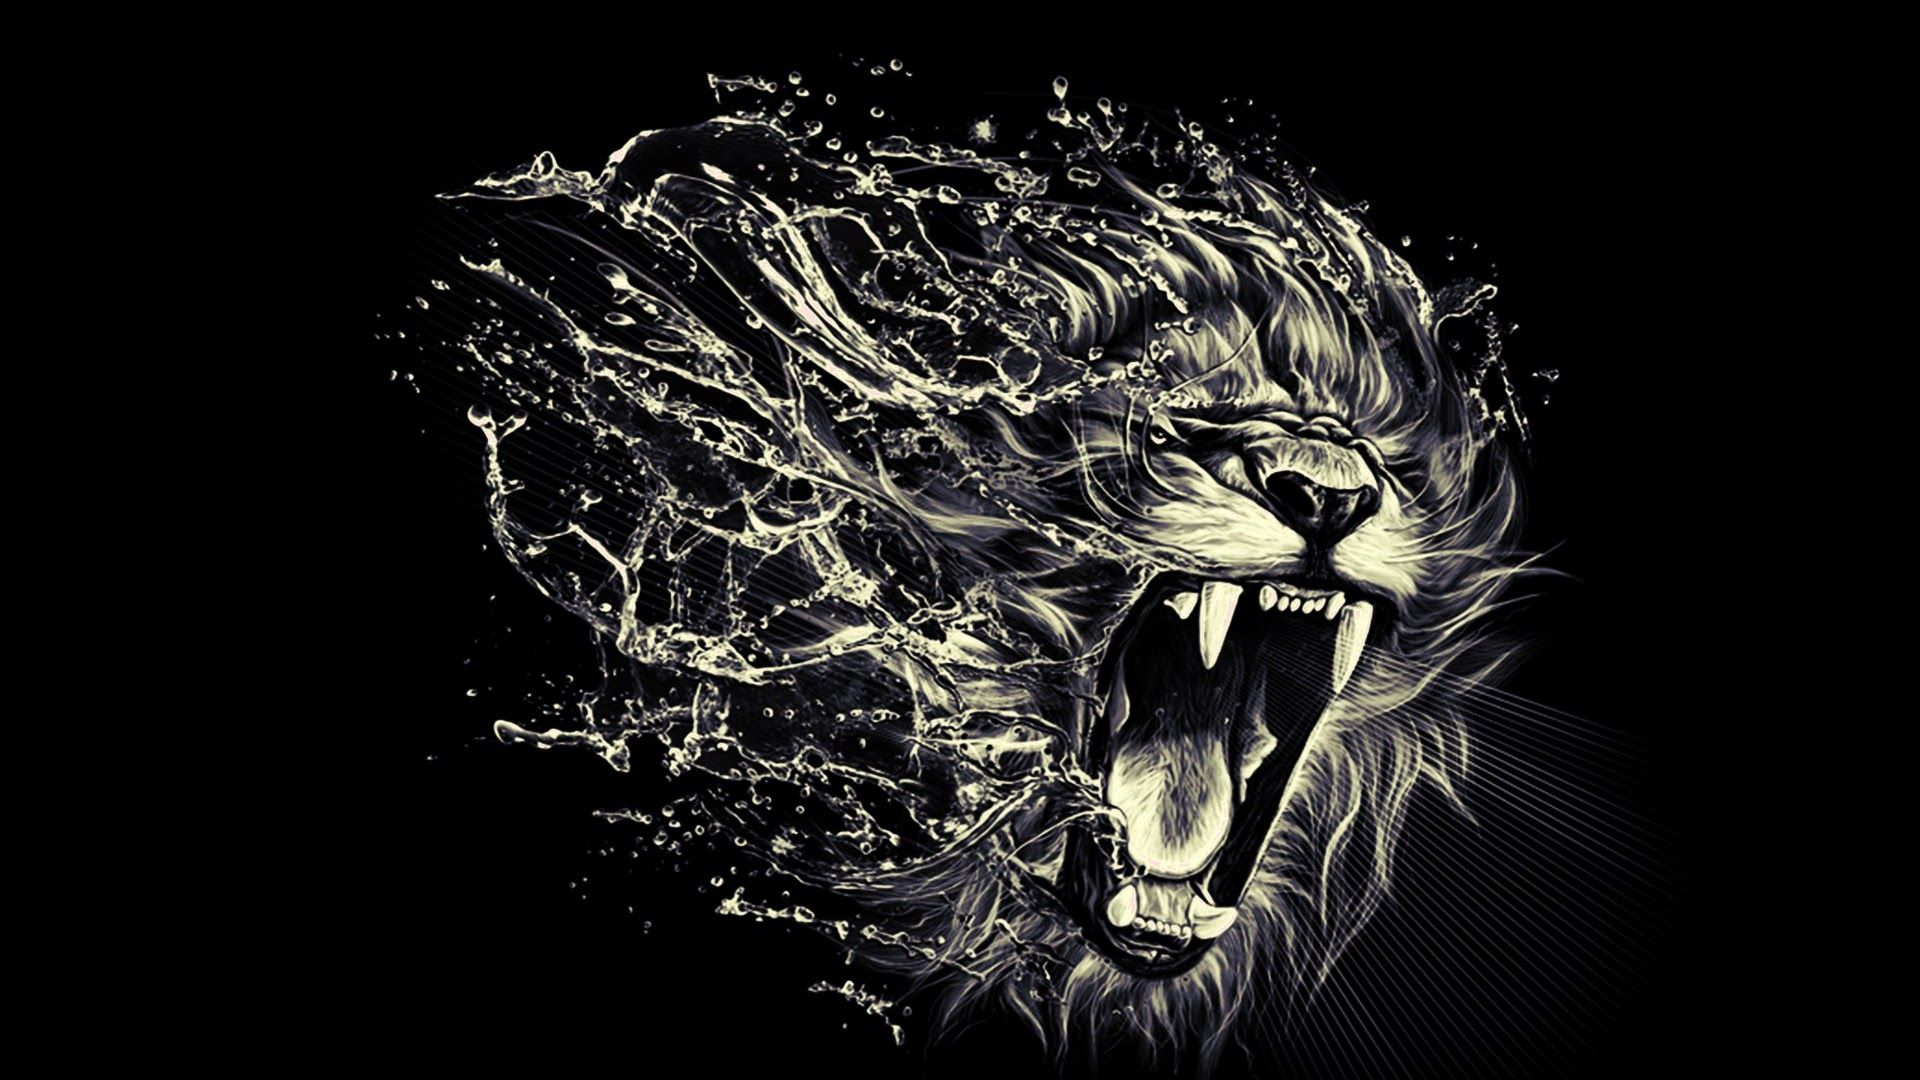 Hd wallpaper lion - Lion Hd Wallpapers Download Hd Wallpapers Pinterest Lion Wallpaper And Wallpaper